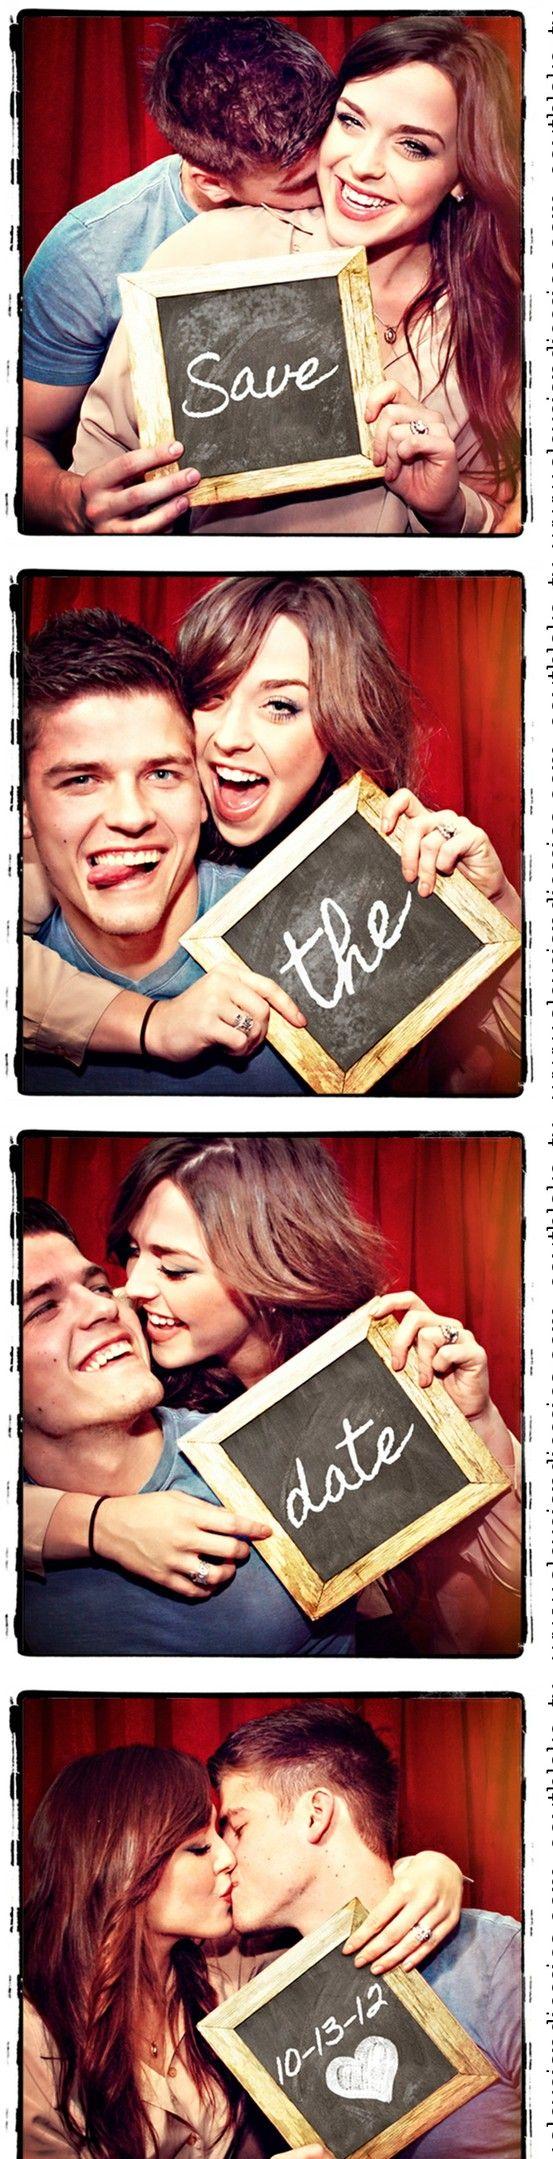 Sooo cute!: Photos Booths, Save The Date Ideas, Engagement Photos, Dates, Cute Ideas, Wedding Announcements, Photobooth, Engagement Picture, Photo Booths